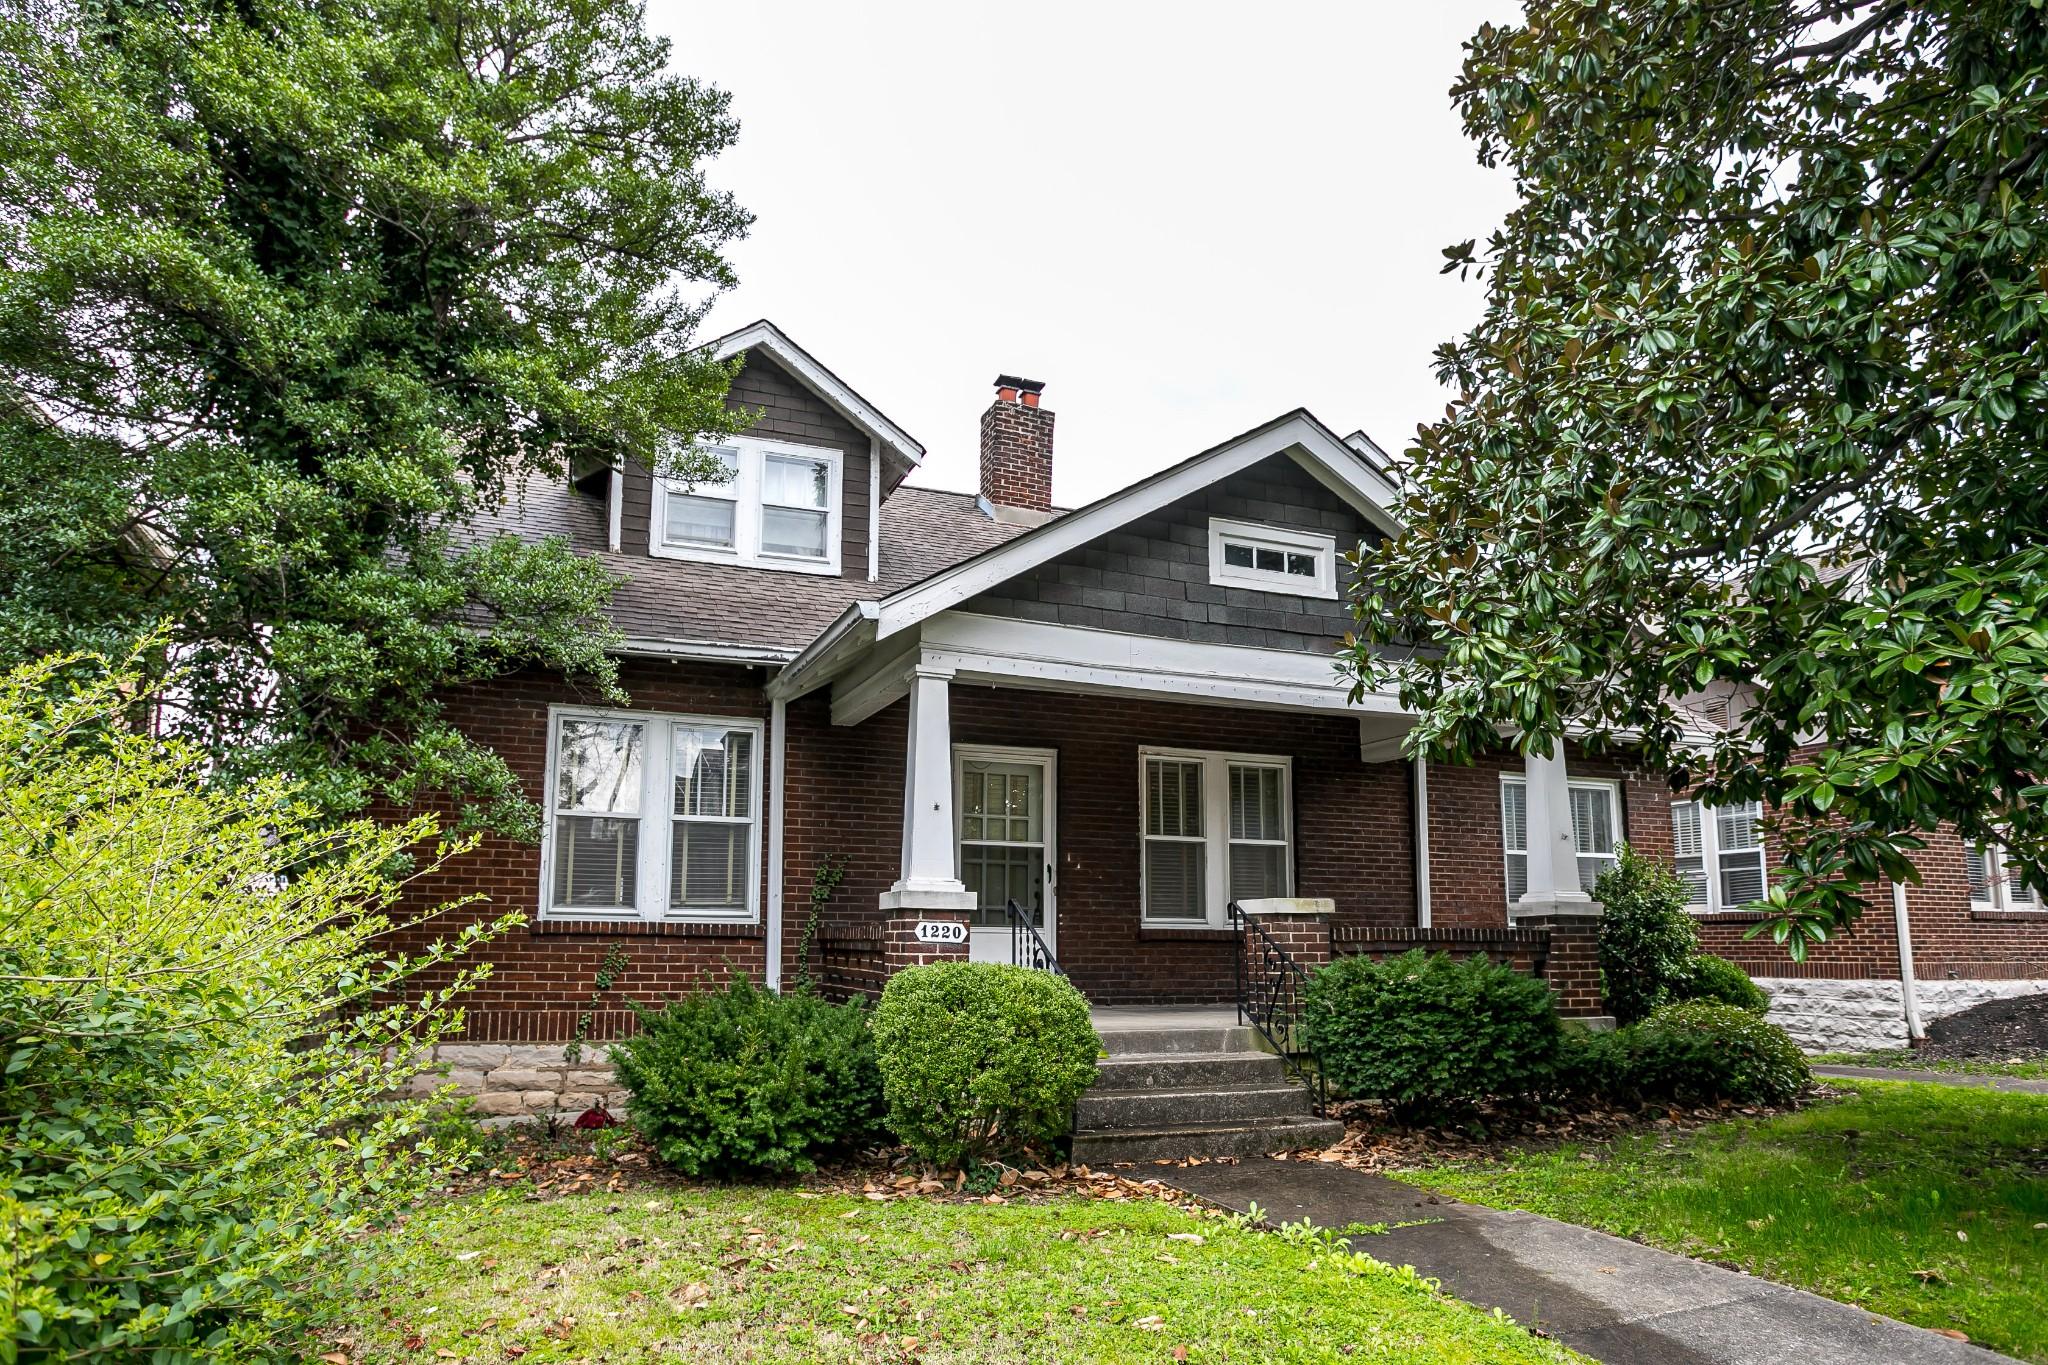 1220 17th Ave S Property Photo - Nashville, TN real estate listing